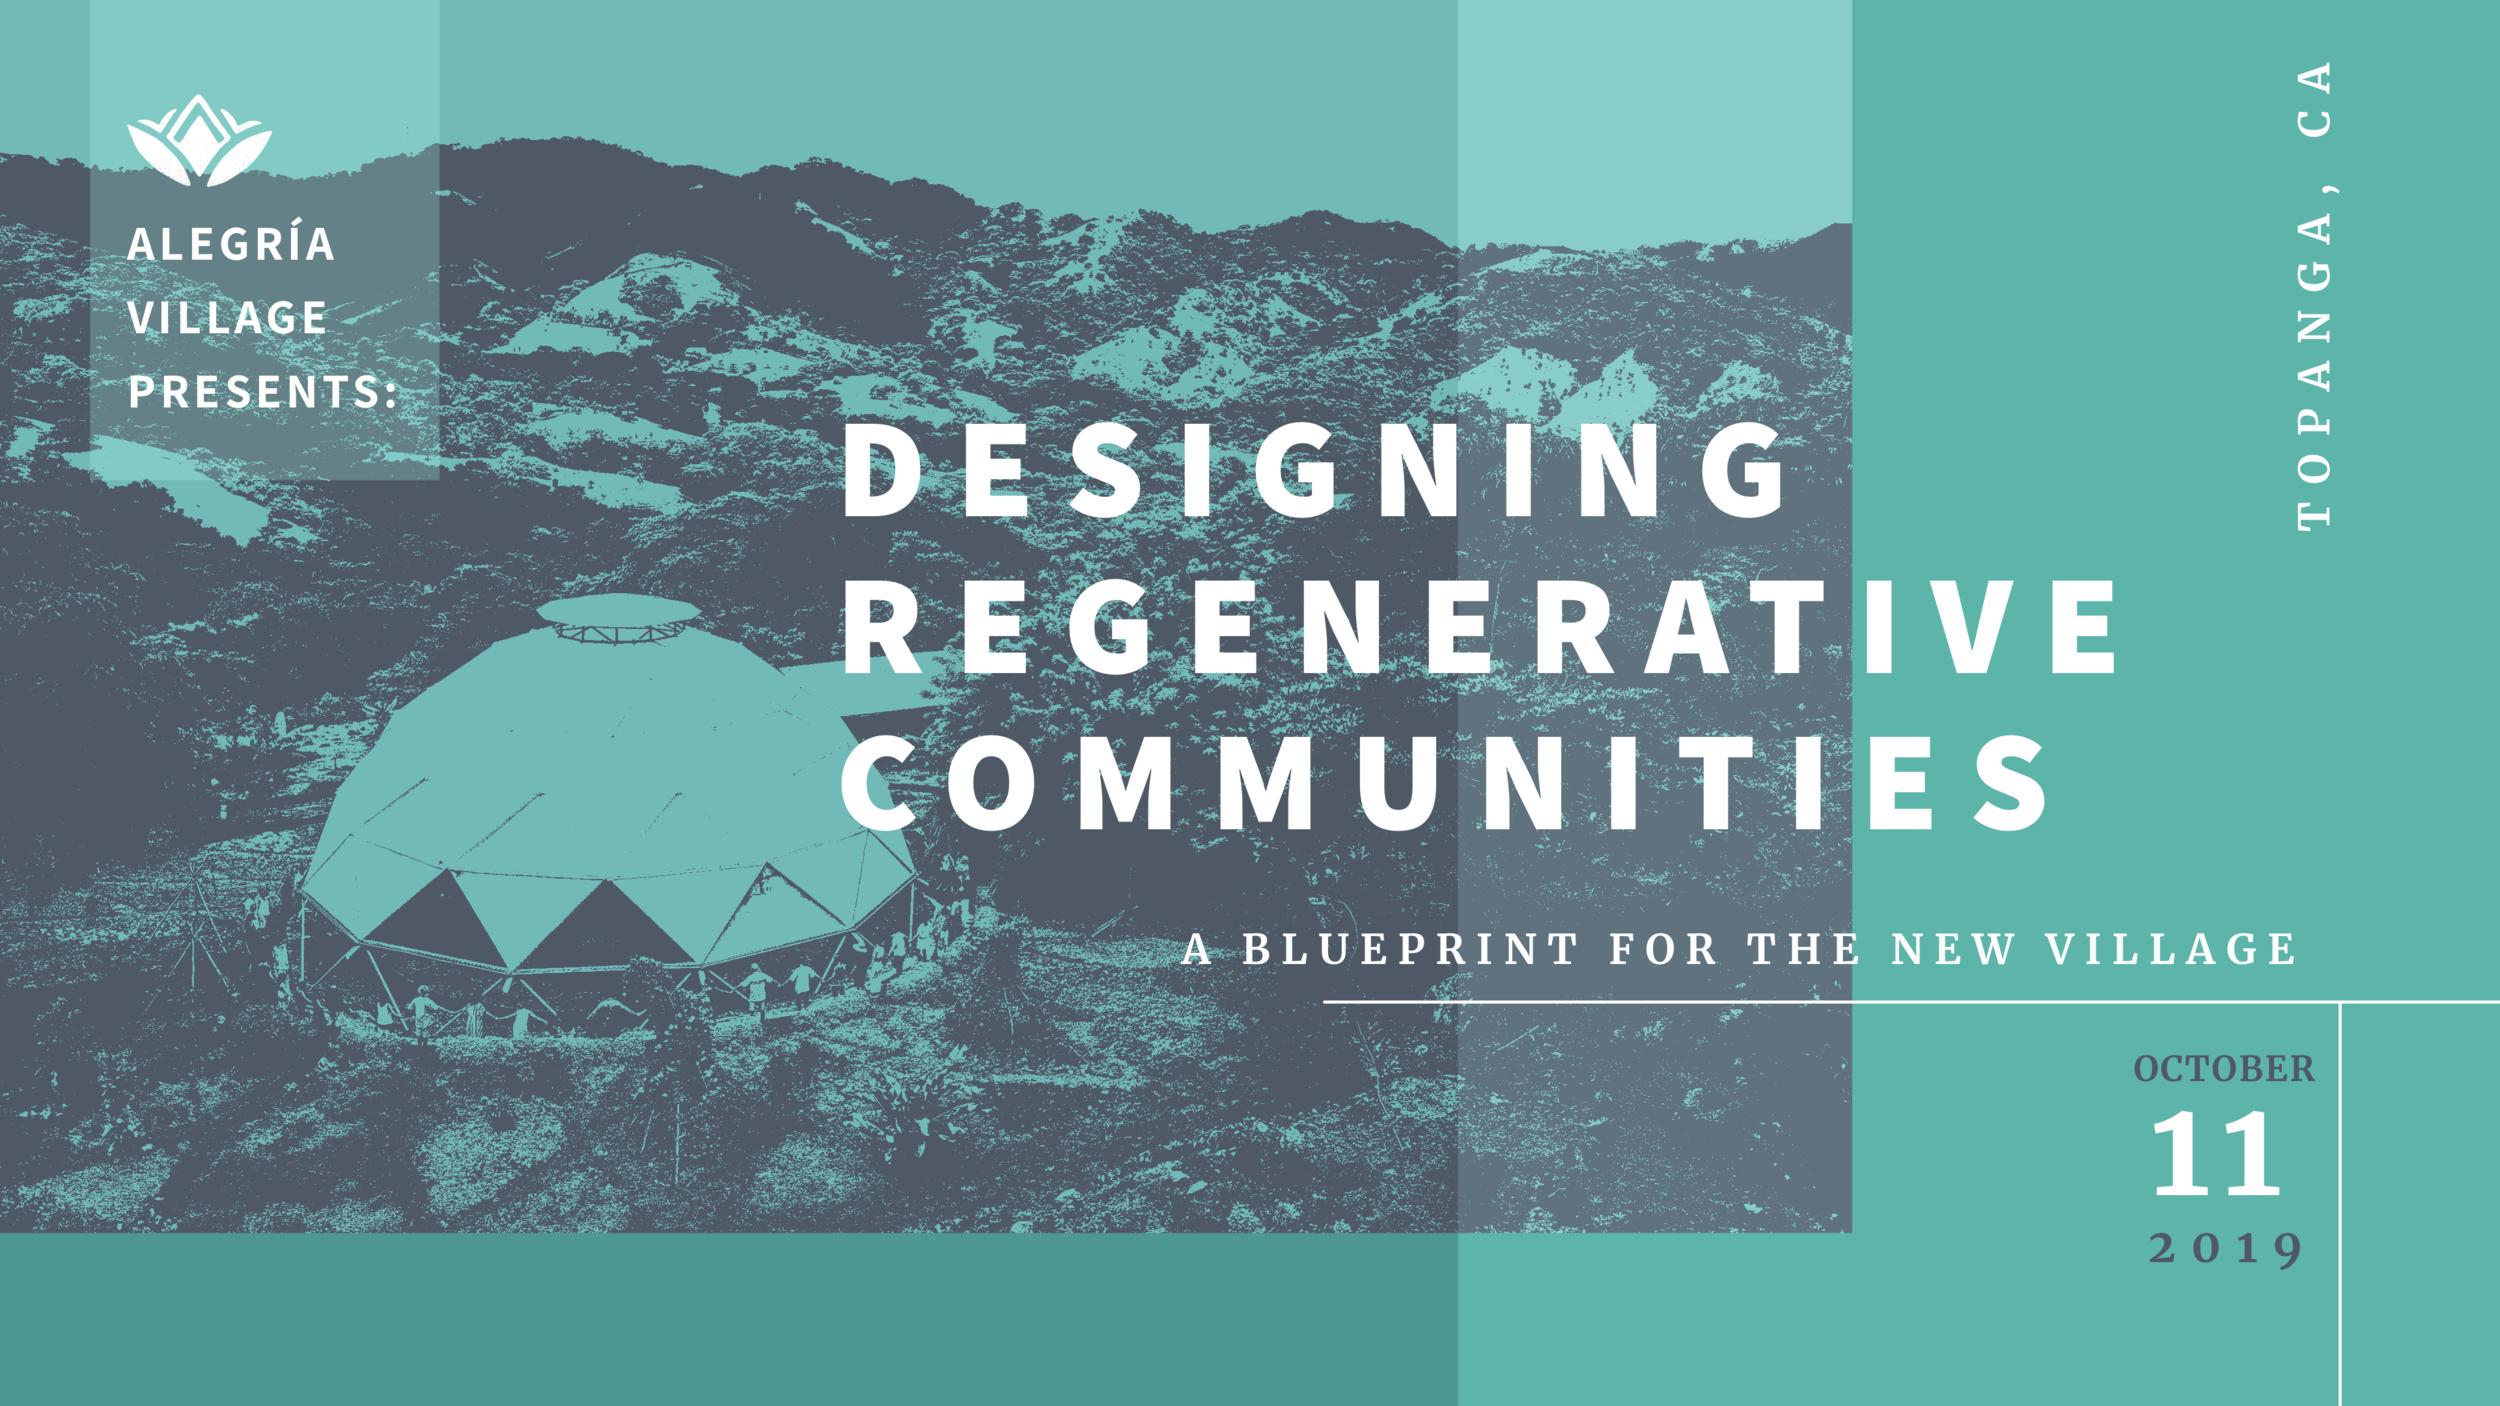 designing-regen-comm-topanga-facebook.png